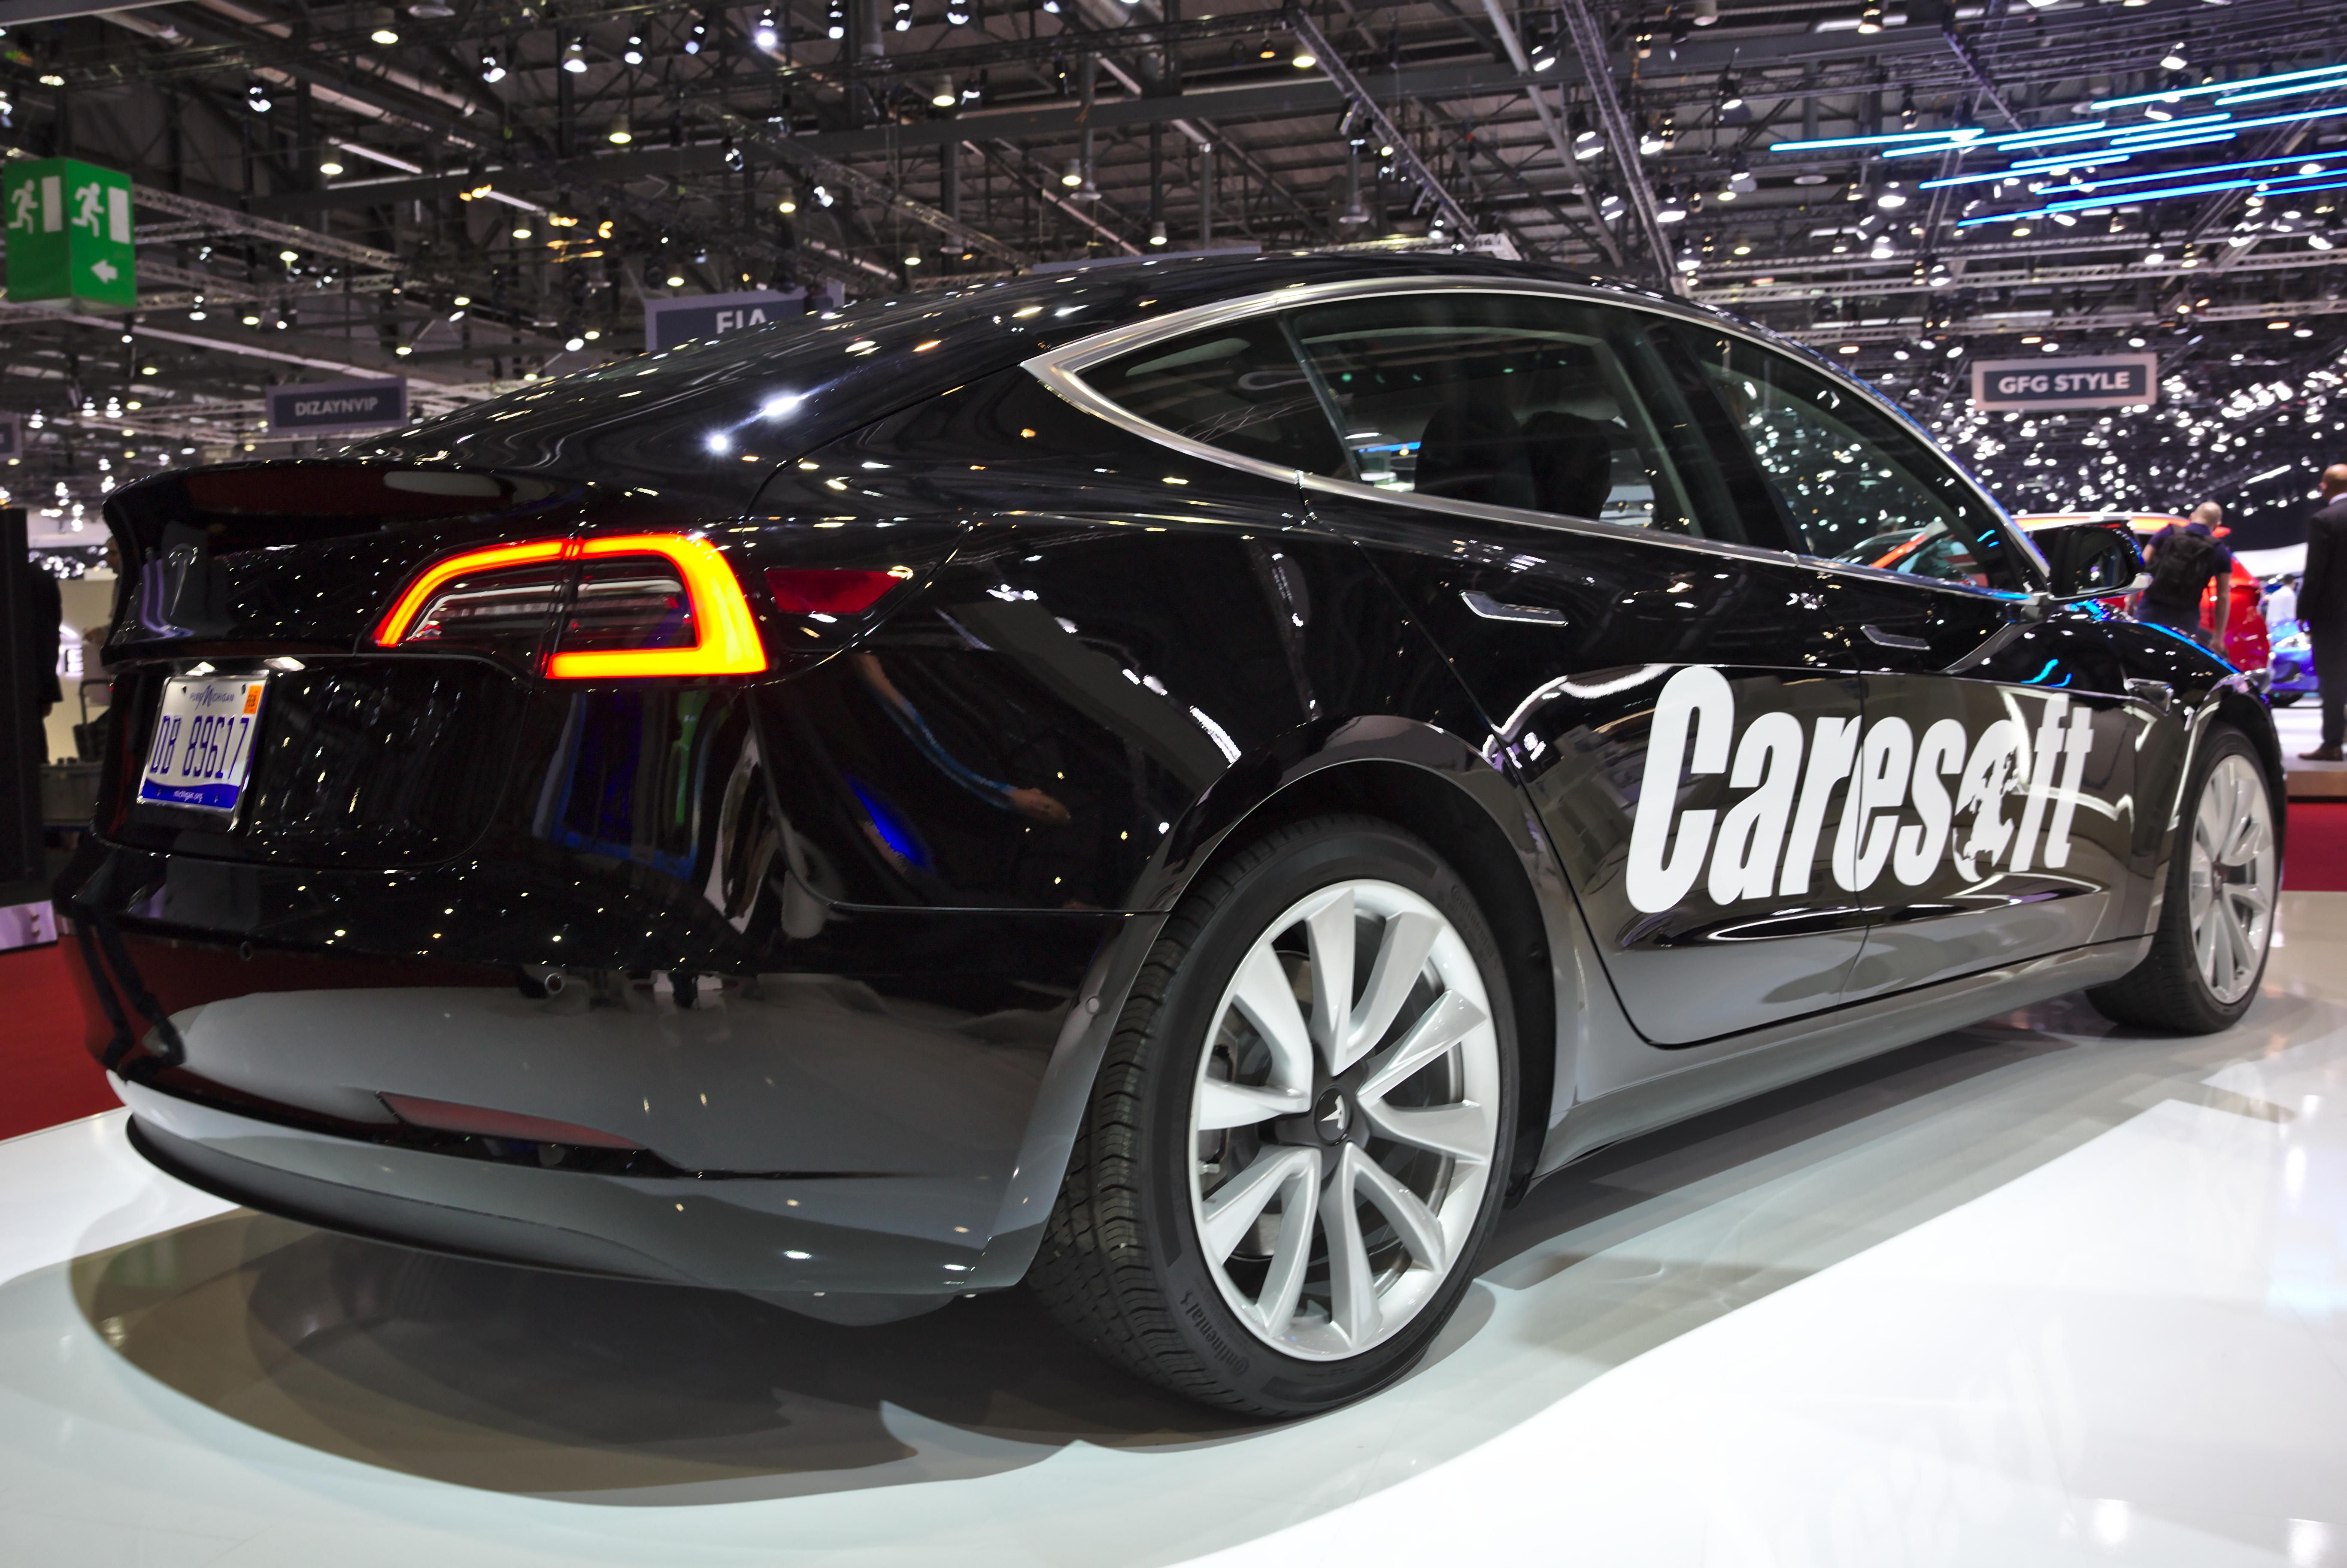 Juego de 4 tapacubos S /& X Tesla Model 3 Welcometo Tapacubos